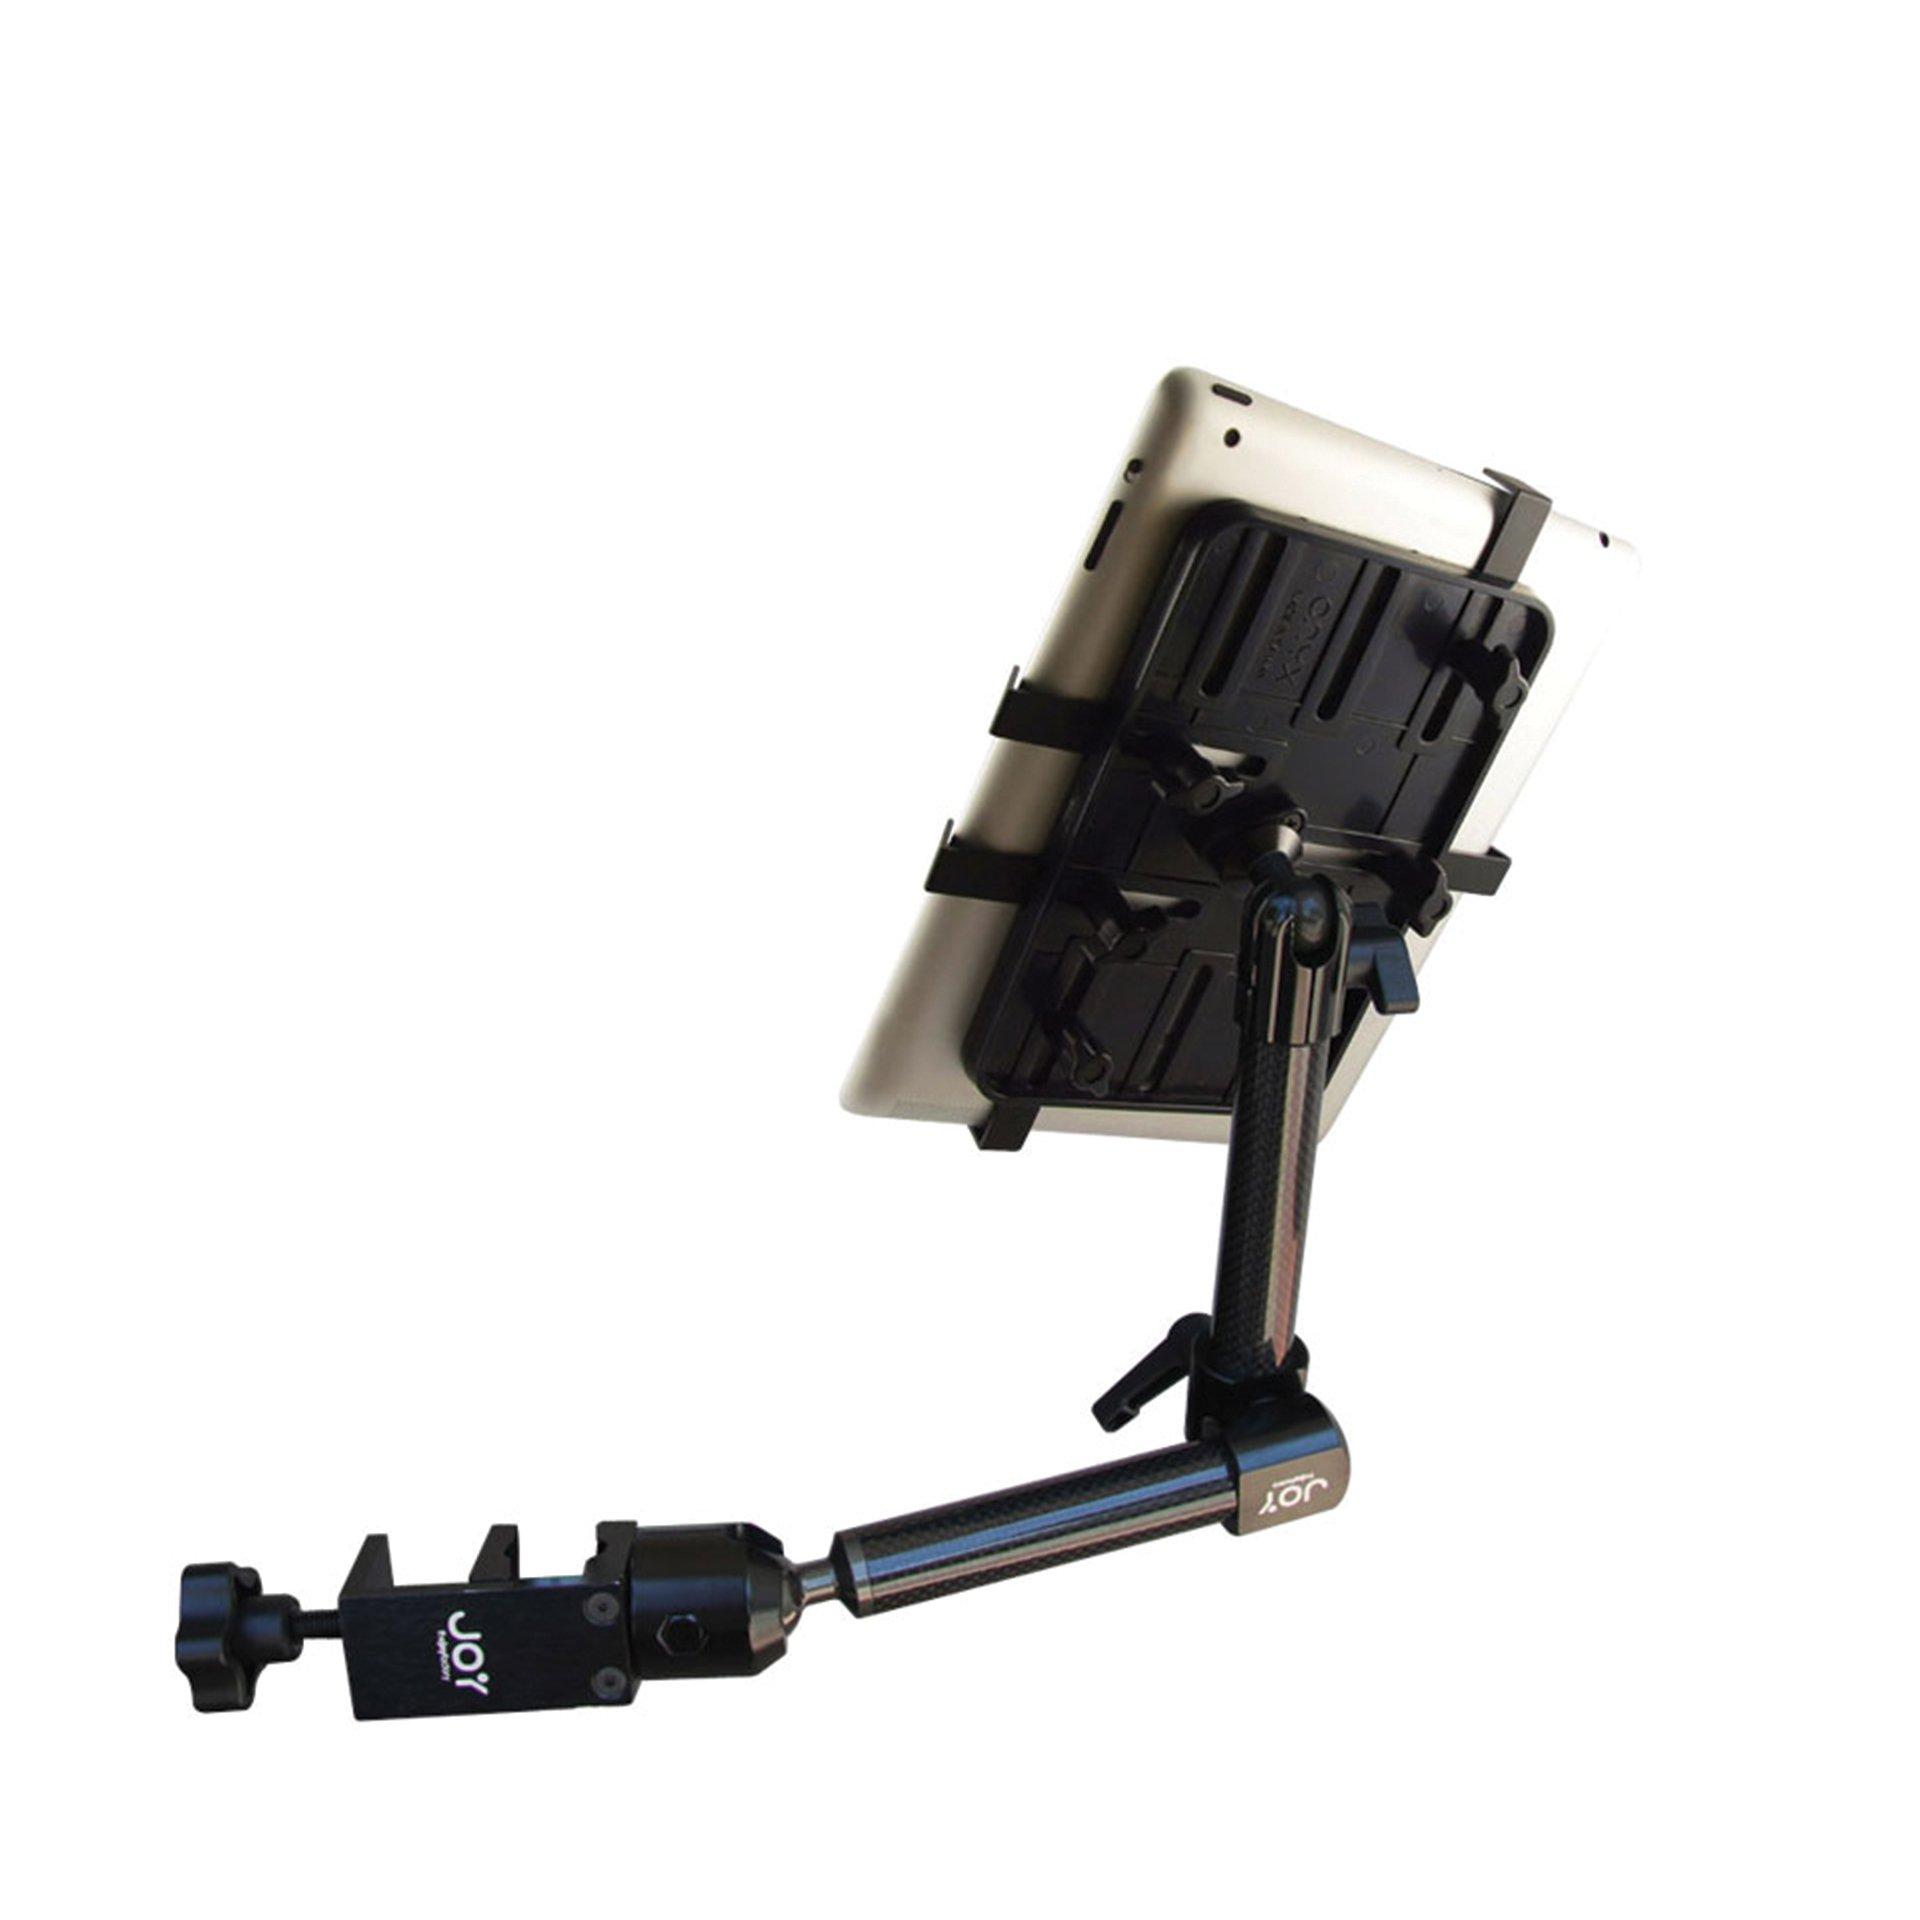 The Joy Factory Unite Universal Carbon Fiber Wheelchar Mount for 7''-11'' Tablets (MNU107)